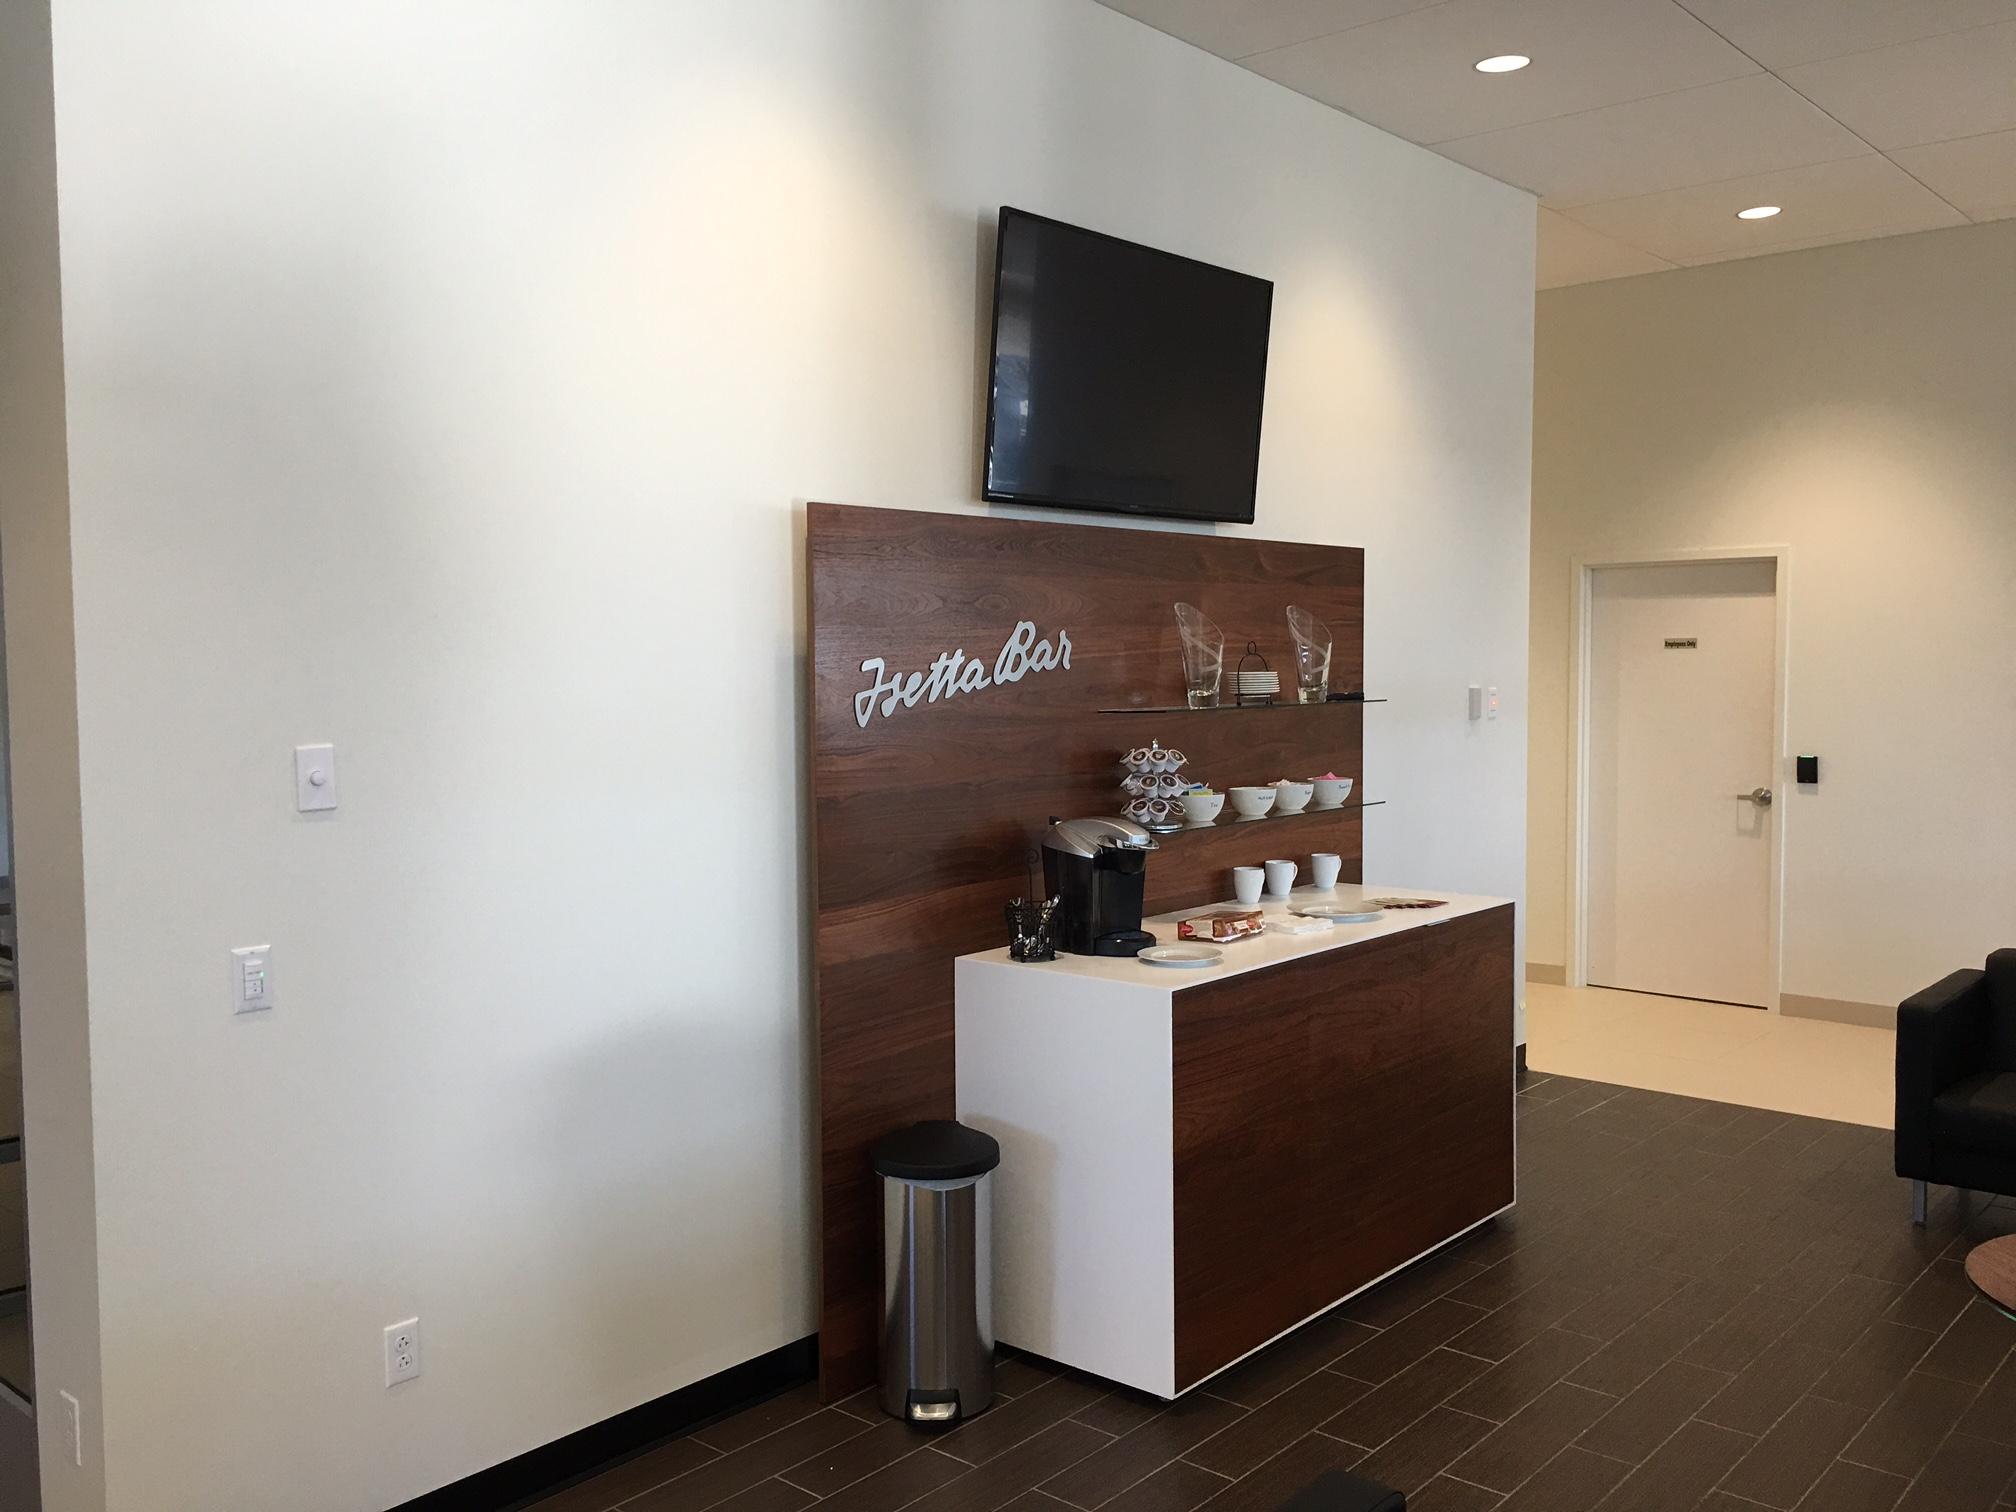 Customer Lounge with free Wi-Fi and Coffee.